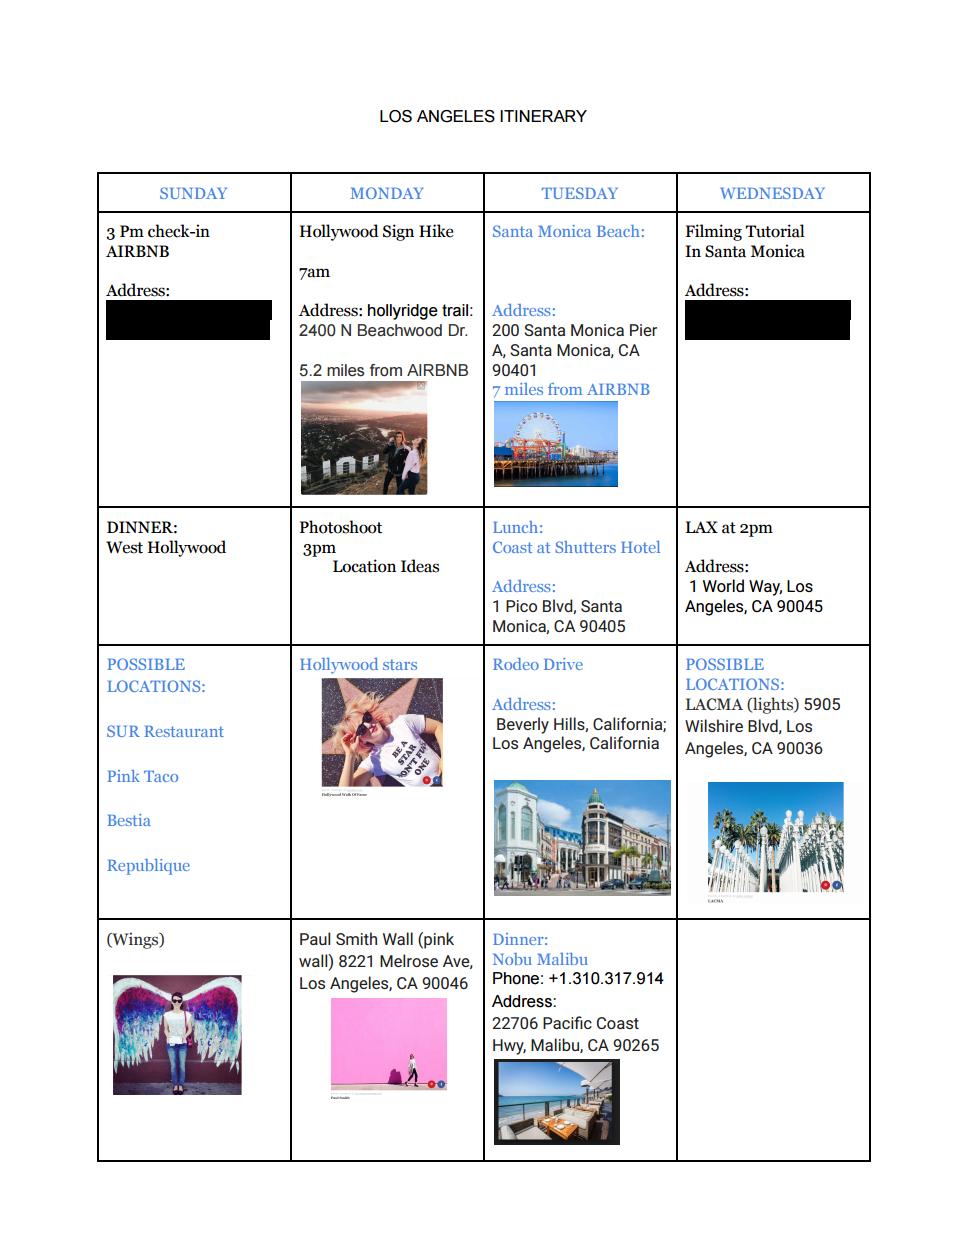 Itineraryexample